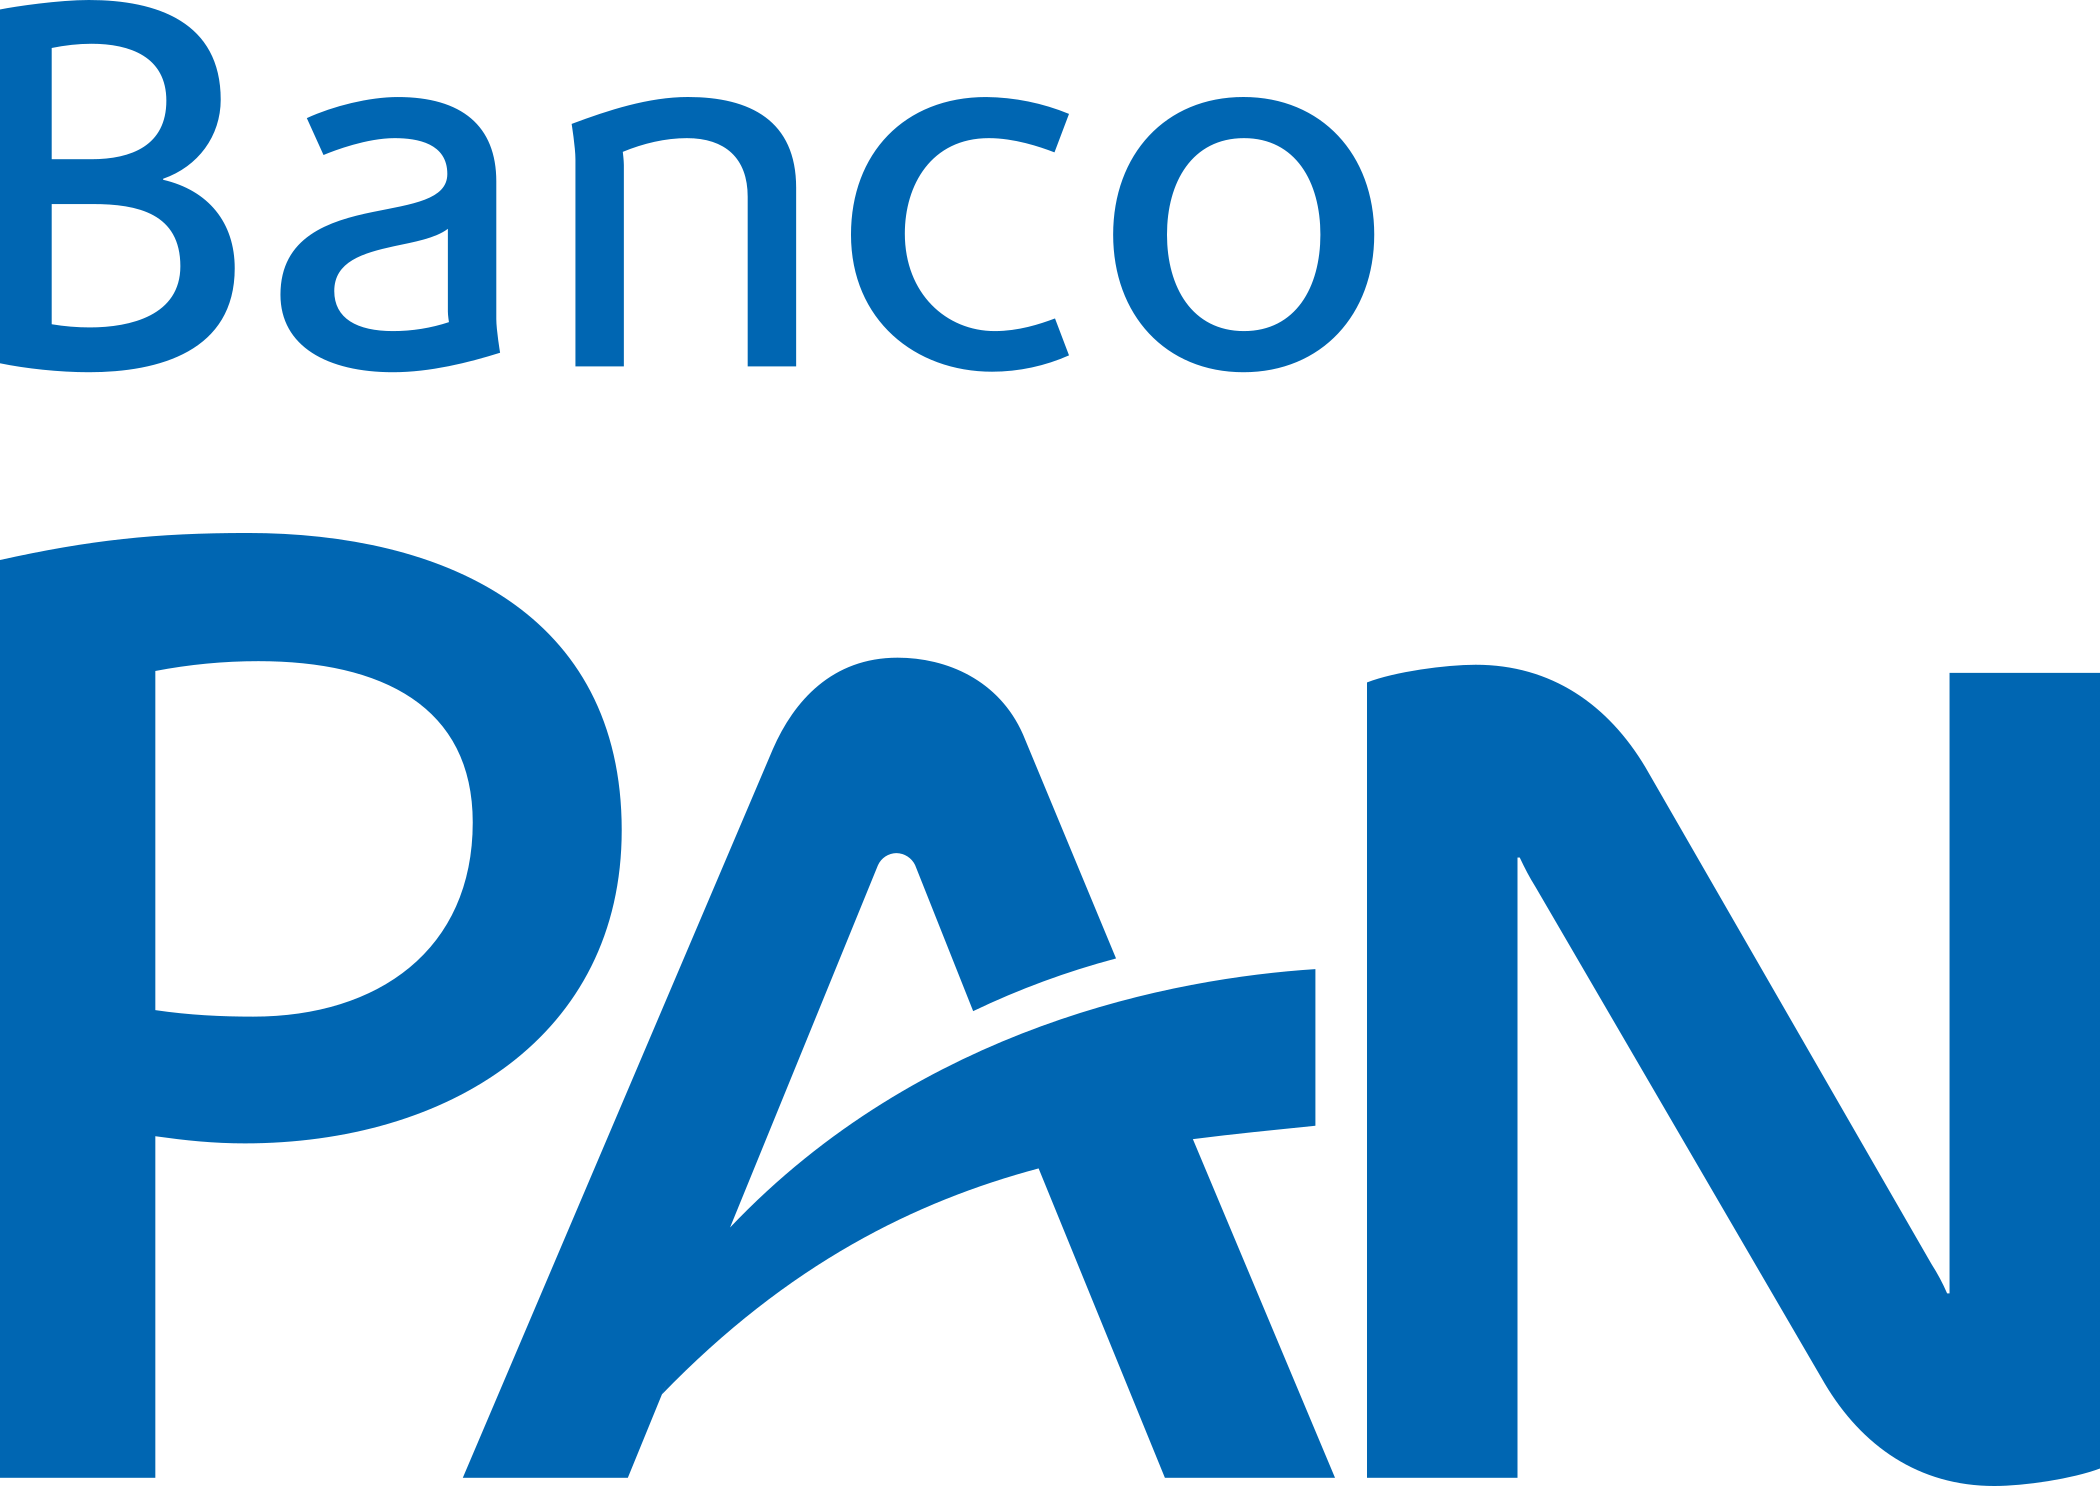 banco-pan-logo-1